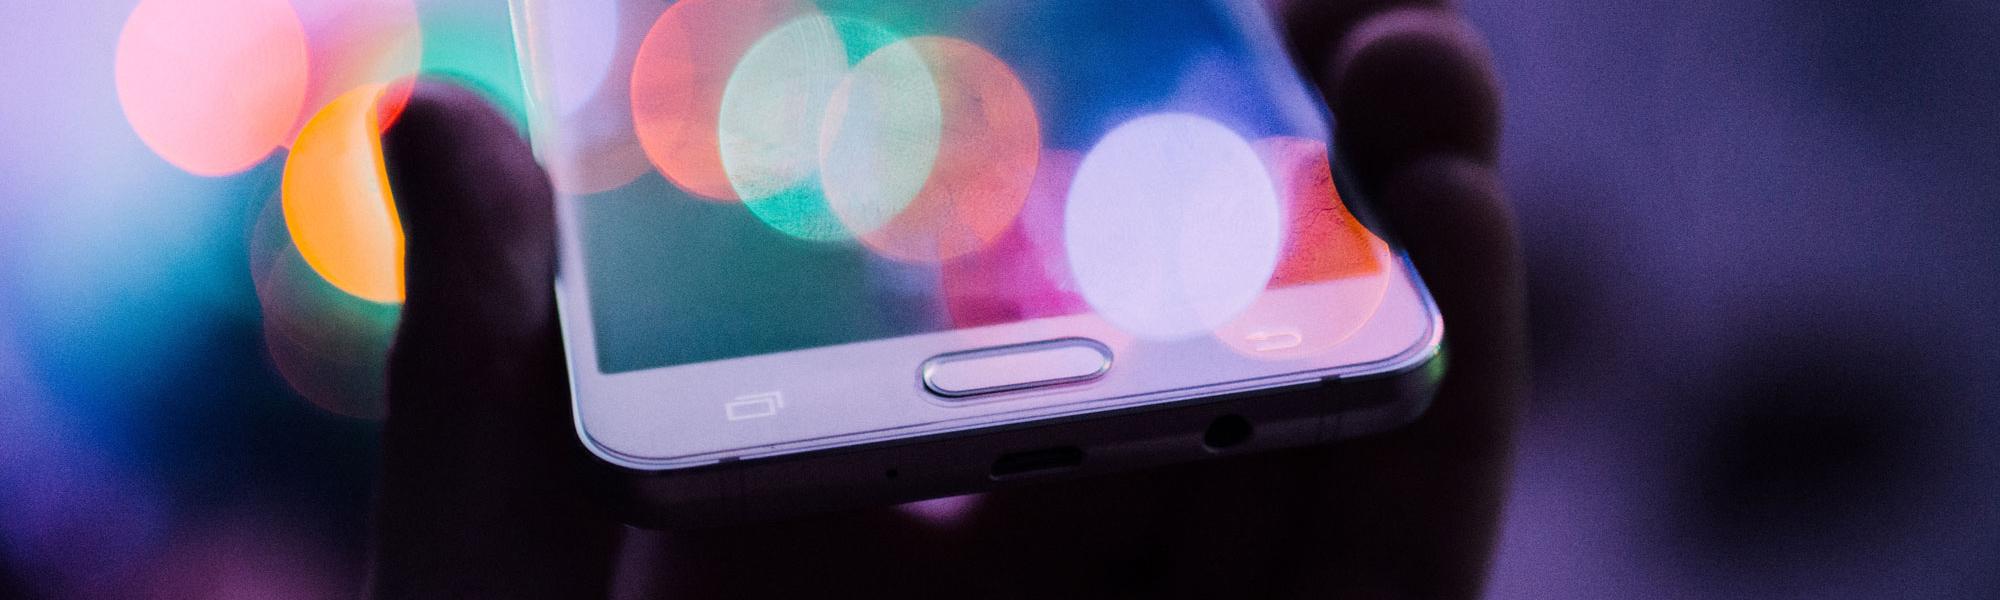 iPhone in evening light Photo by Rodion Kutsaev on Unsplash